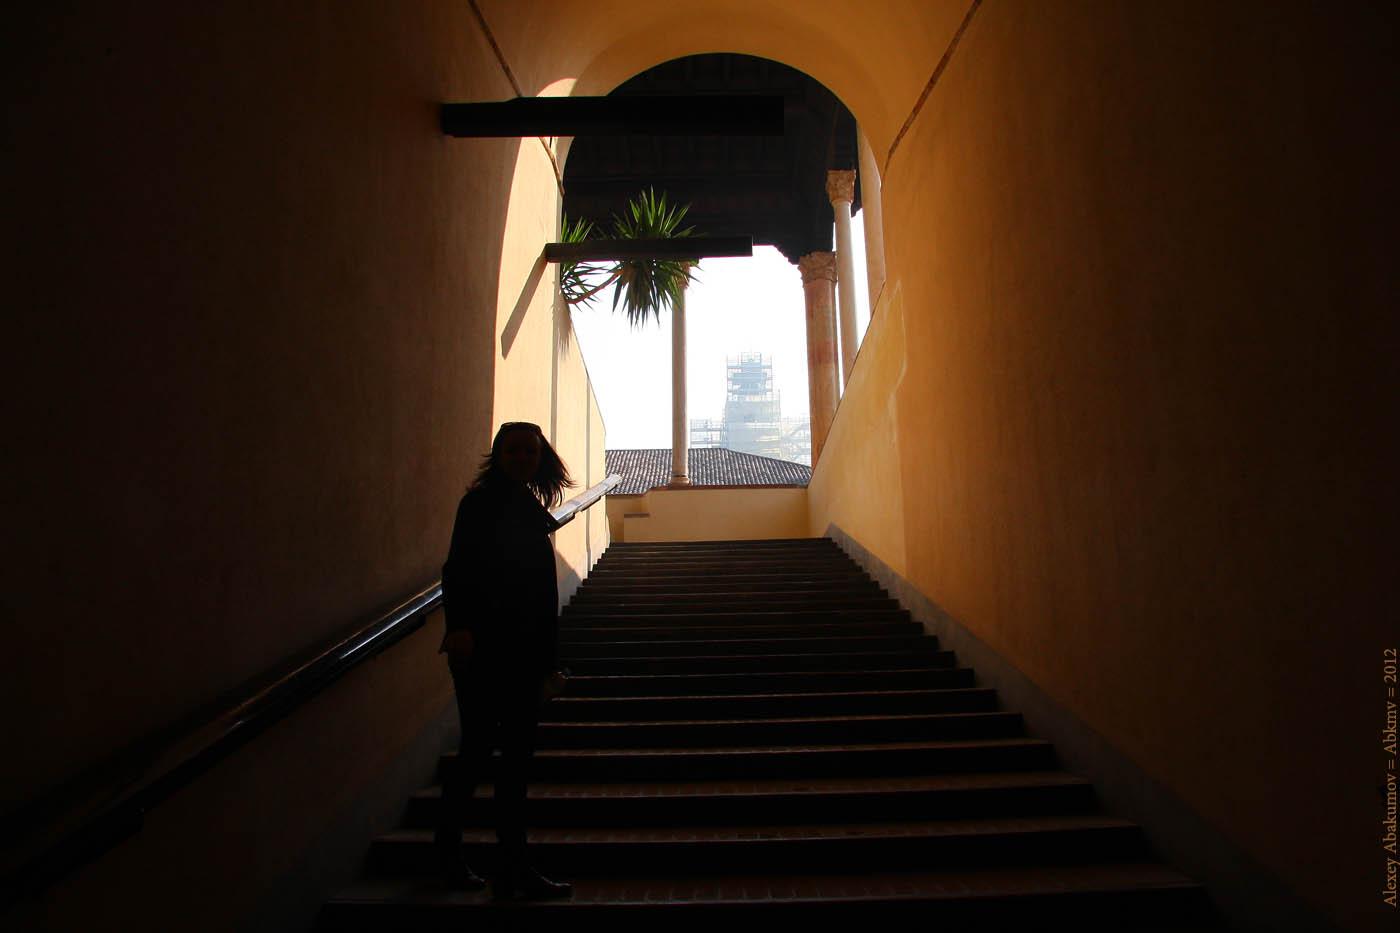 Замок Сфорцеско, Милан. Фото: Алексей Абакумов. Италия, 2011 год